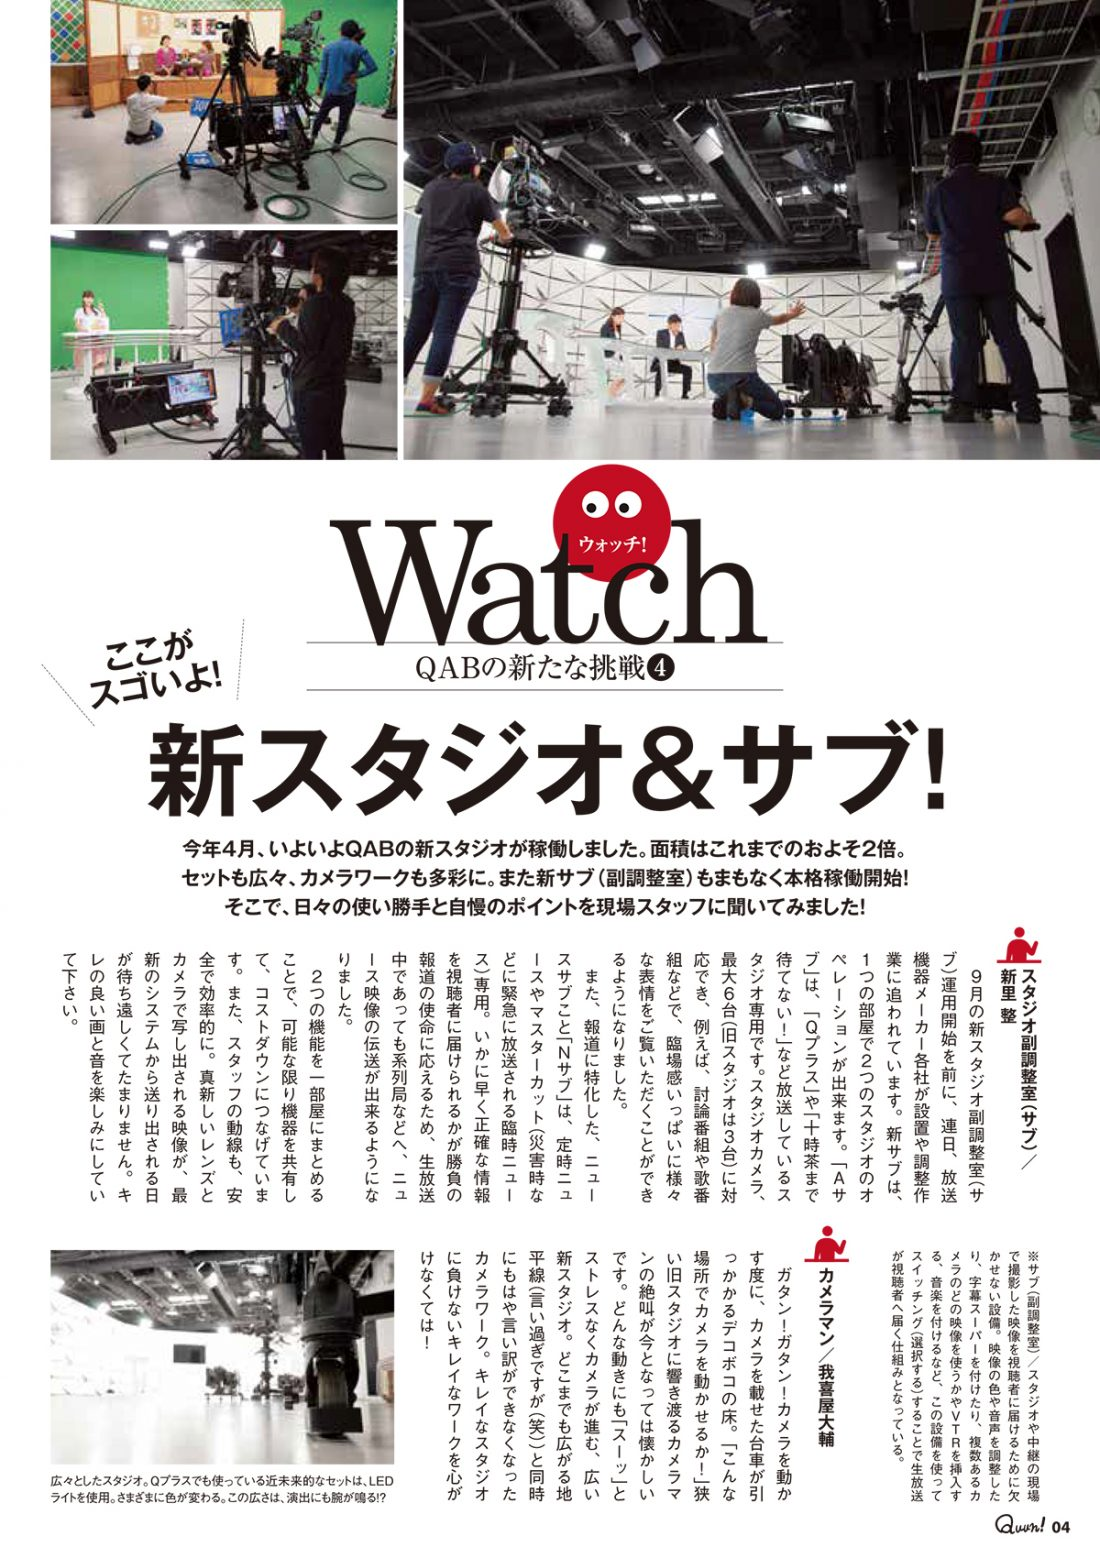 https://www.qab.co.jp/qgoro/wp-content/uploads/quun_0806-1100x1558.jpg